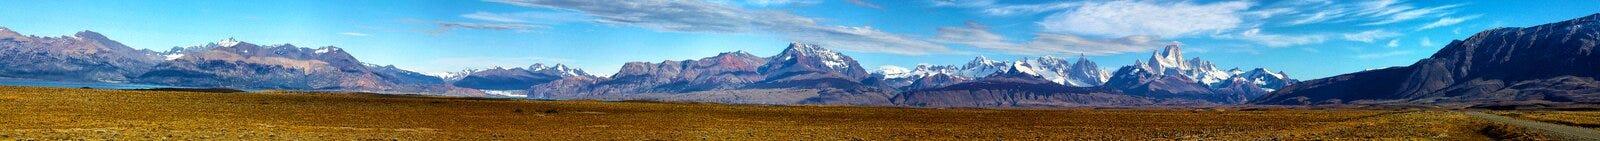 Panorama di Fitz Roy, Patagonia, Argentina Immagini Stock Libere da Diritti